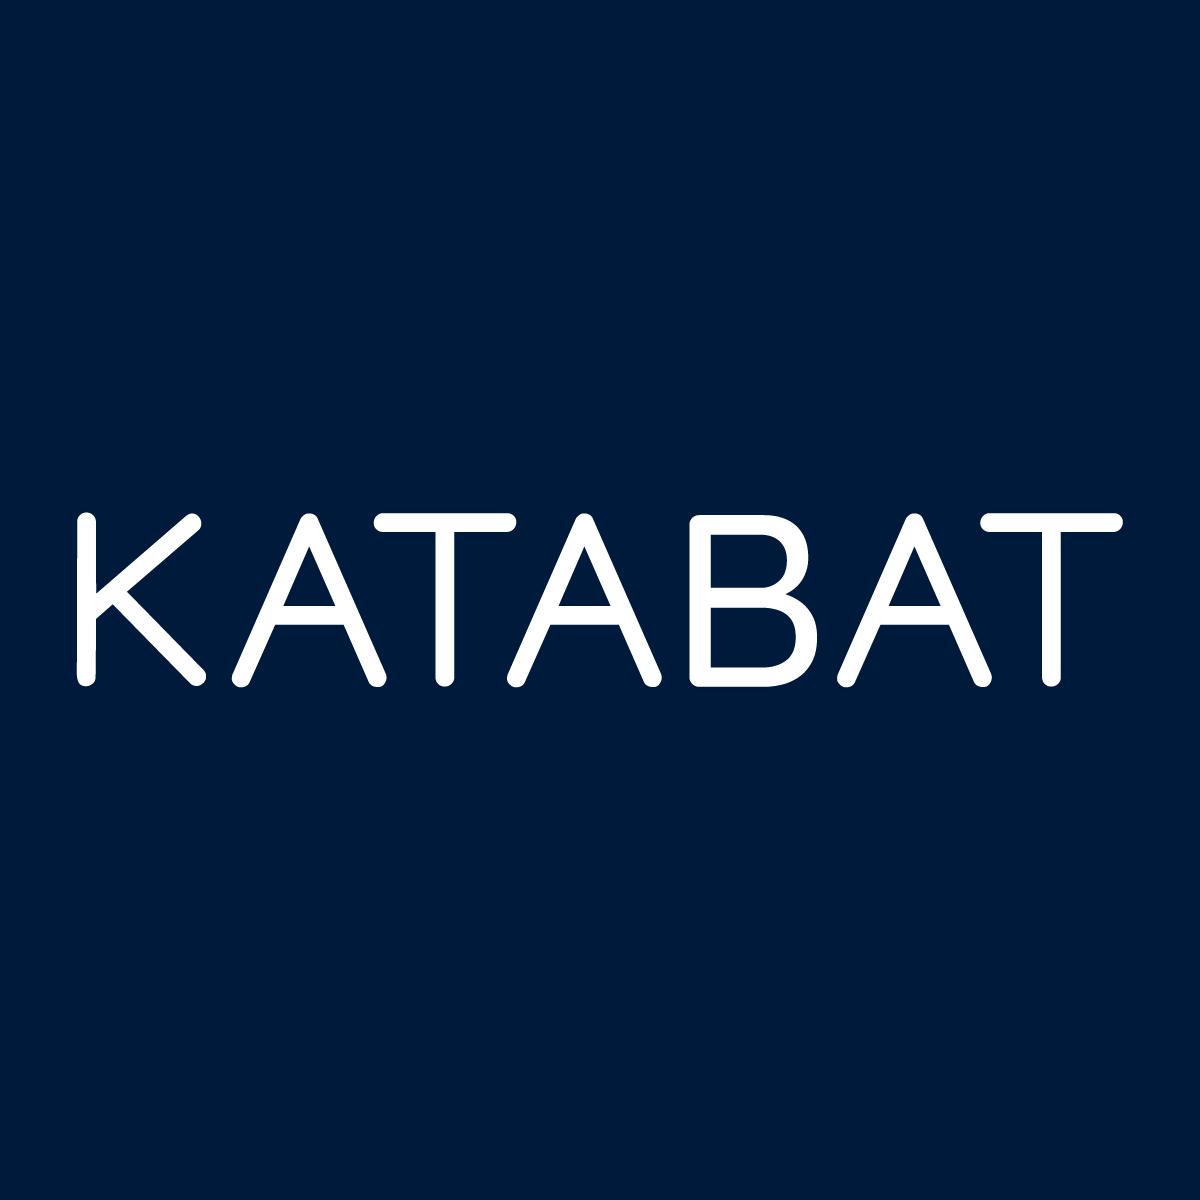 Katabat logo